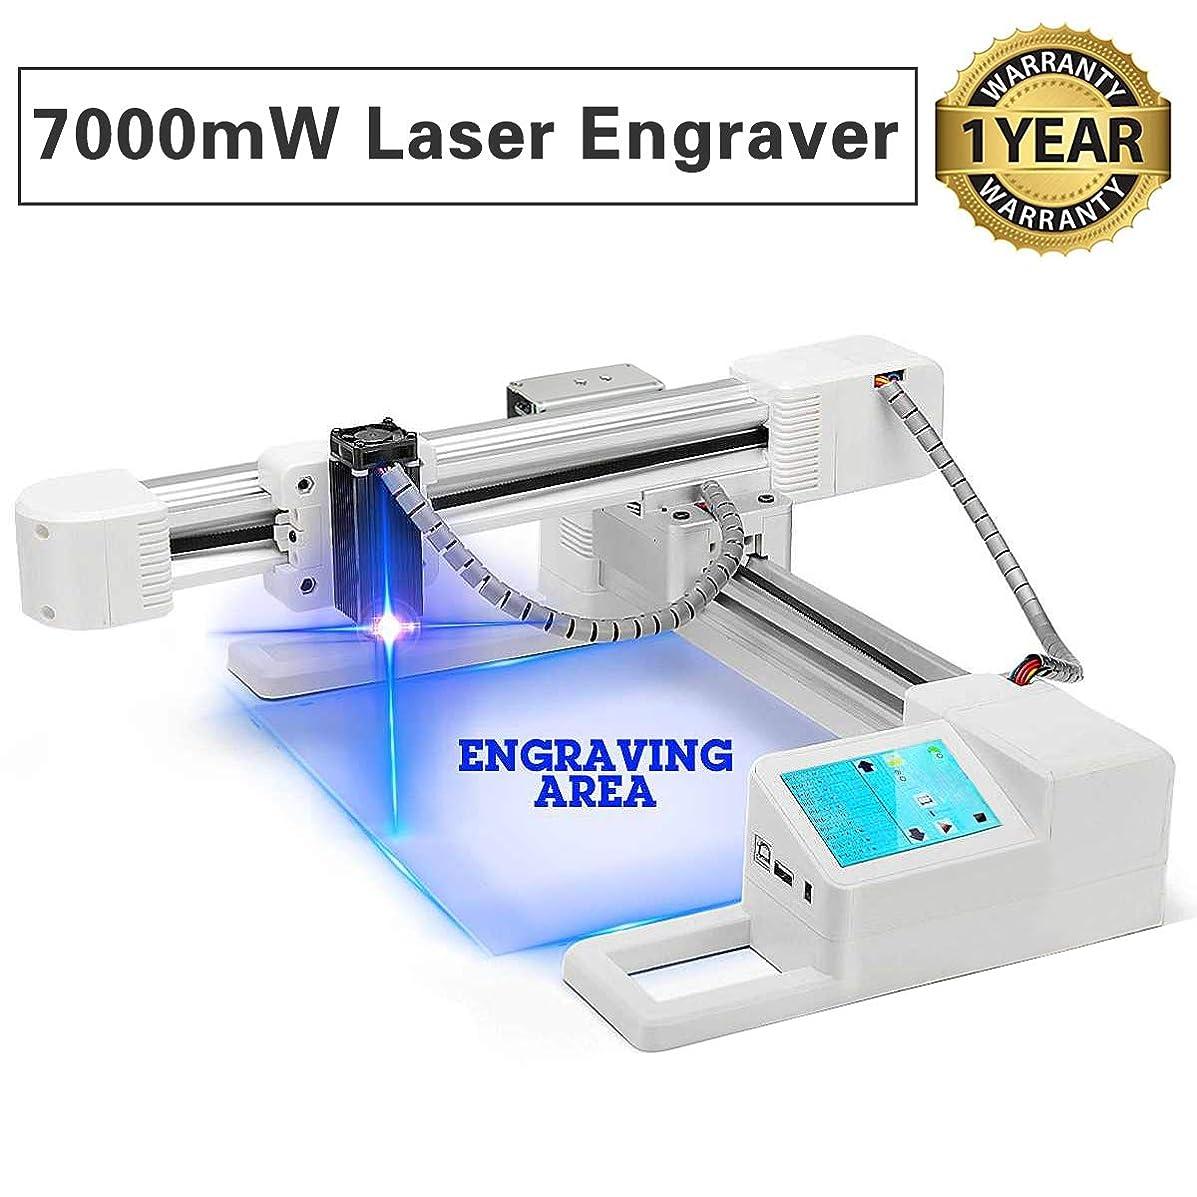 7000mW Off-line Laser Engraving Machine, USB Mini Desktop Laser Engraver Printer, Carver Size 155x175mm, High Speed Laser Engraving Cutter for Stainless Steel, Painted Metal Surface, Wood, Plastic